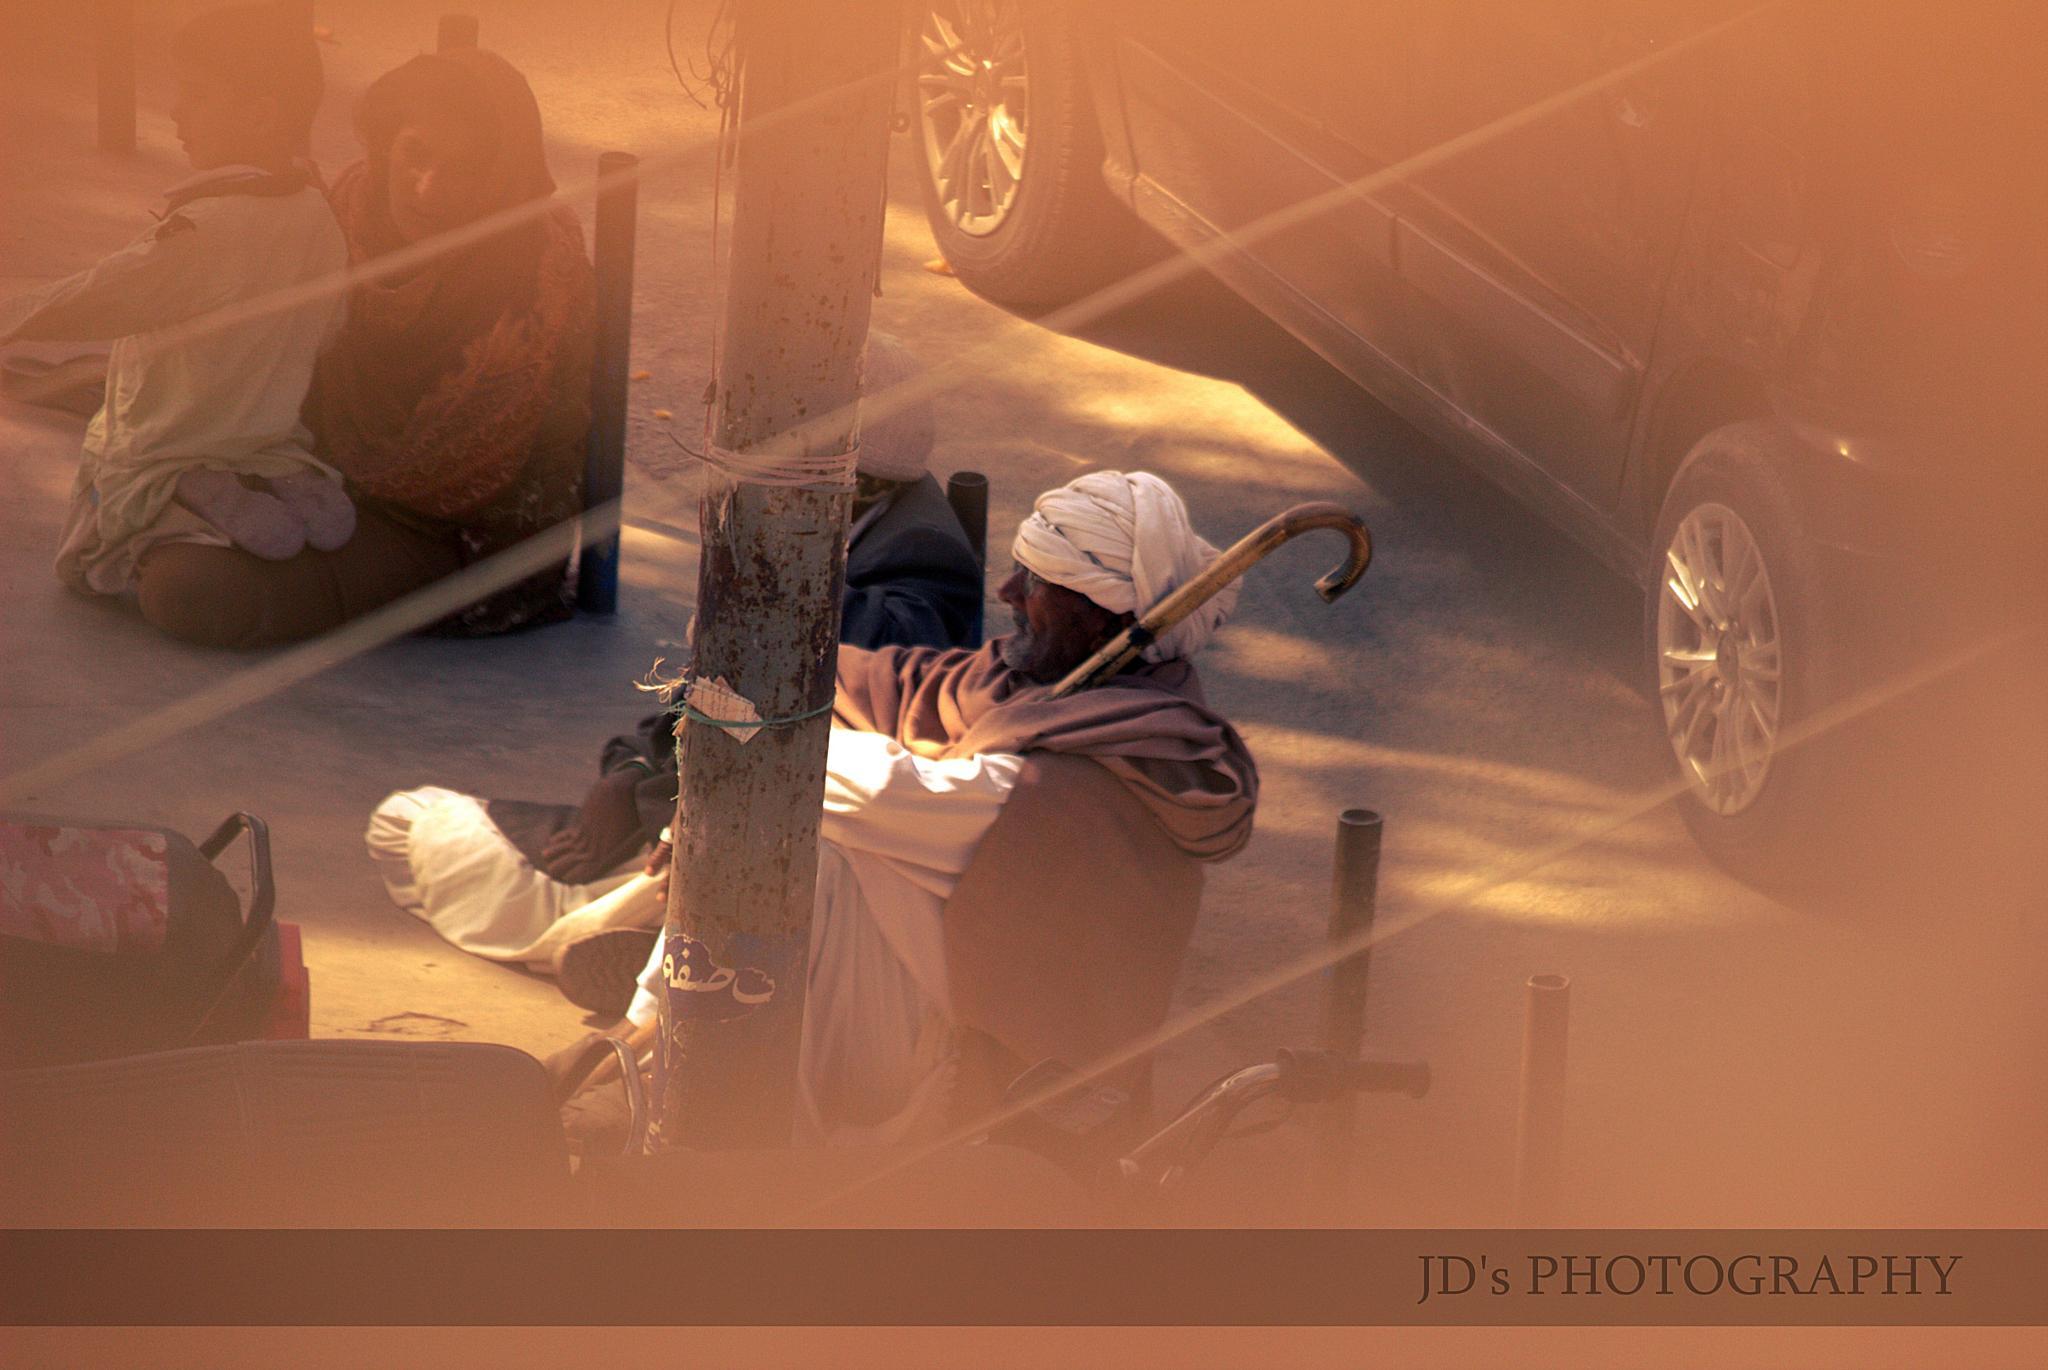 JDs PHOTOGRAPHY by jawwad.khalil.16